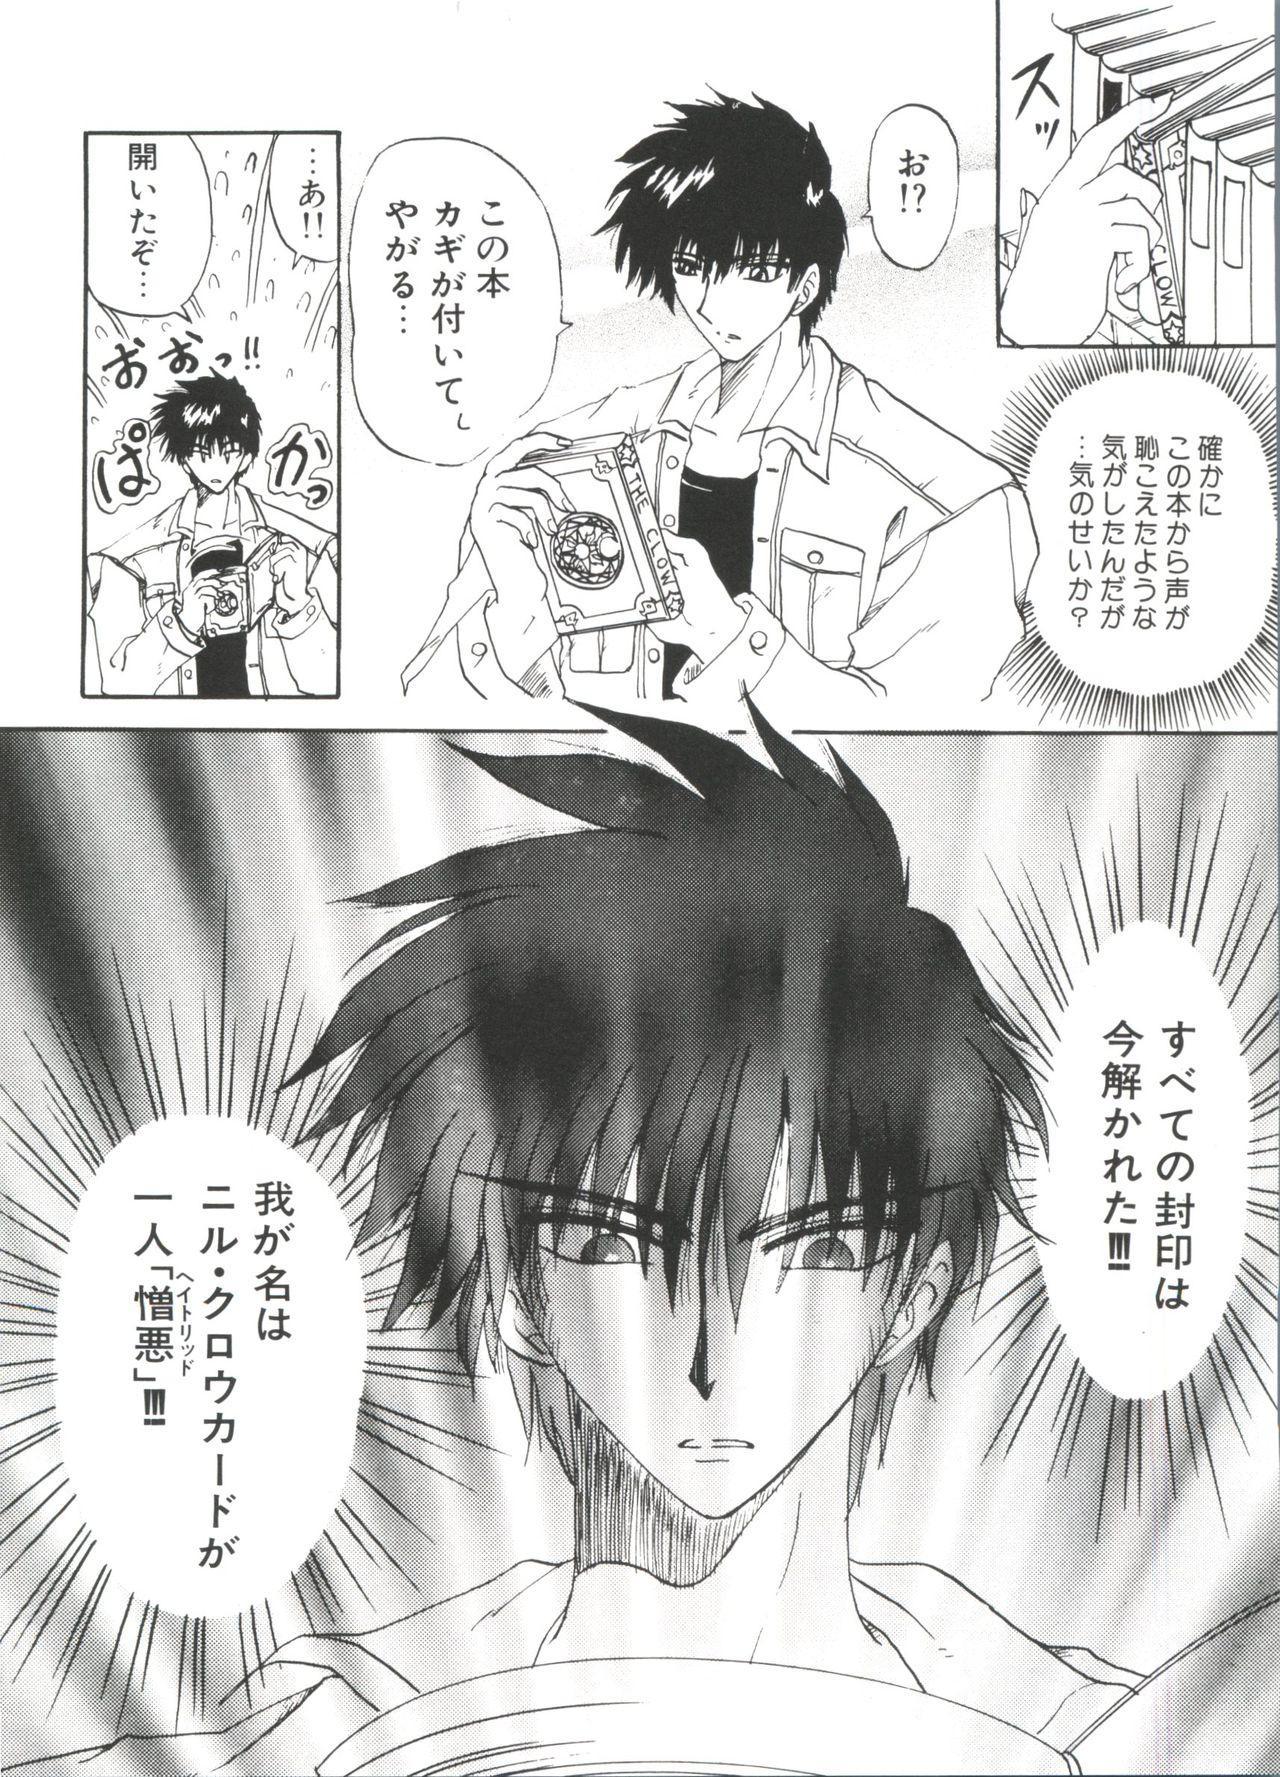 Ero-chan to Issho 2 99